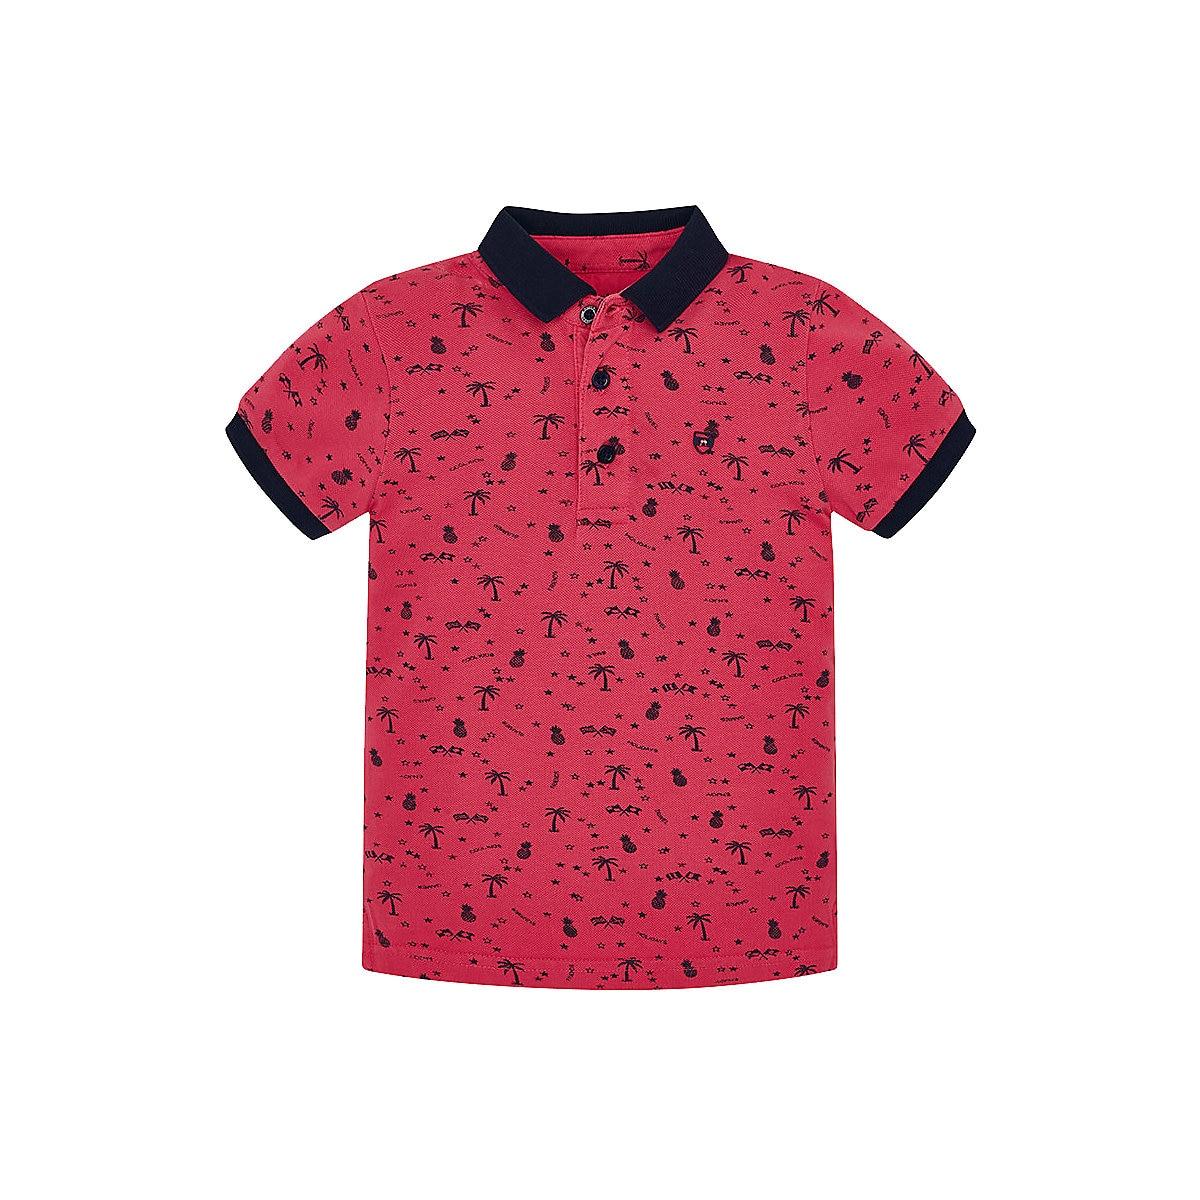 MAYORAL Polo Shirts 10688472 children clothing t-shirt shirt the print for boys